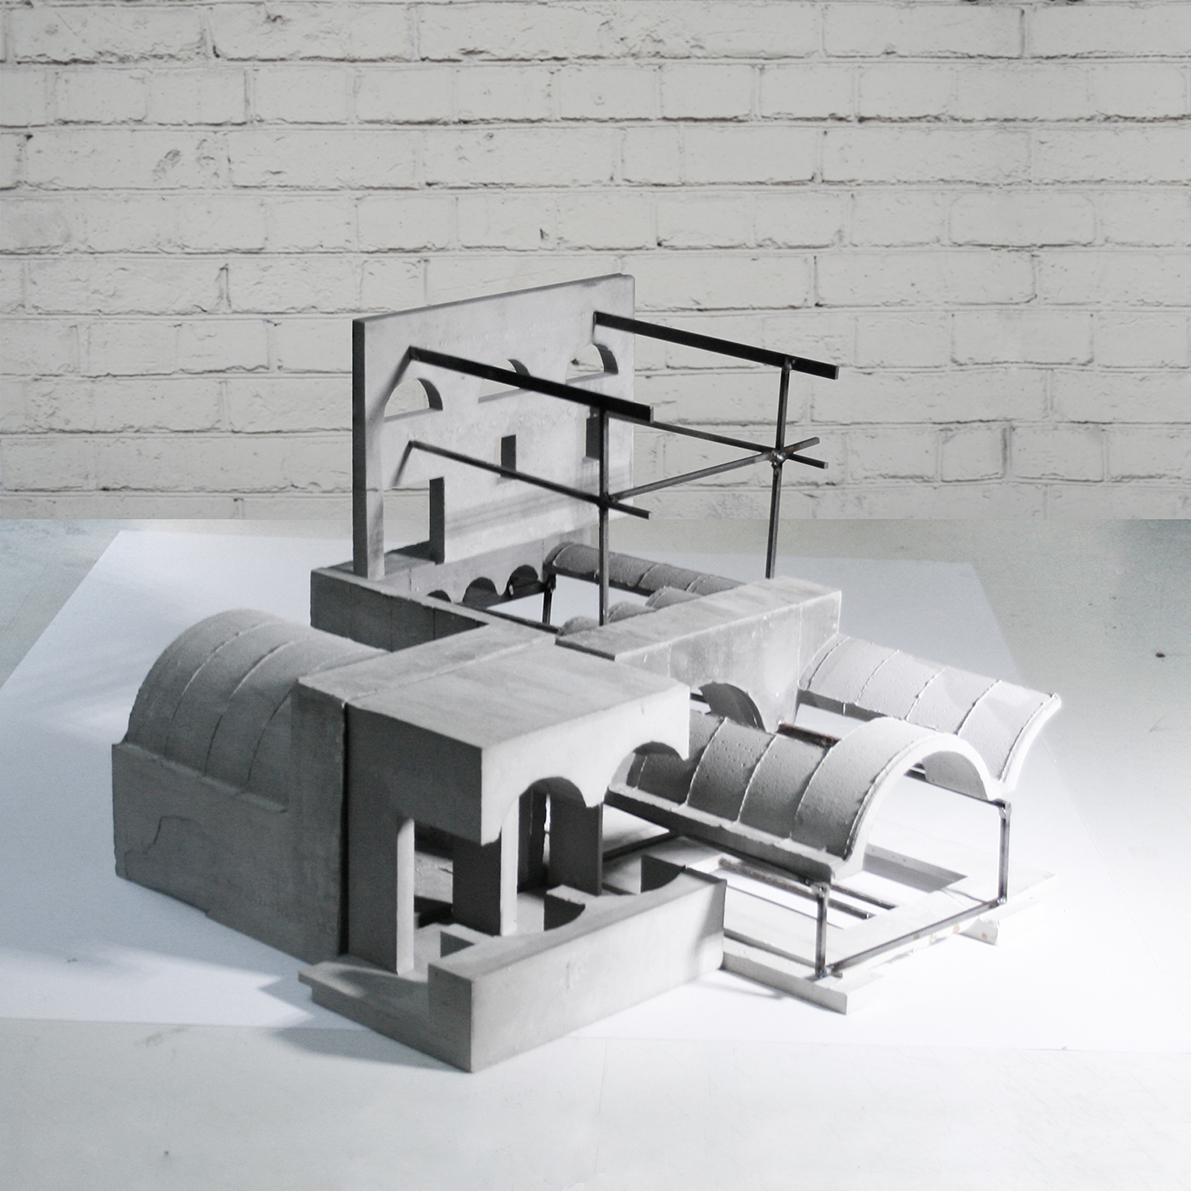 Roberto Boettger, Reconciling Infrastructural Artefacts (fonte: modelarchitecture.tumblr.com)